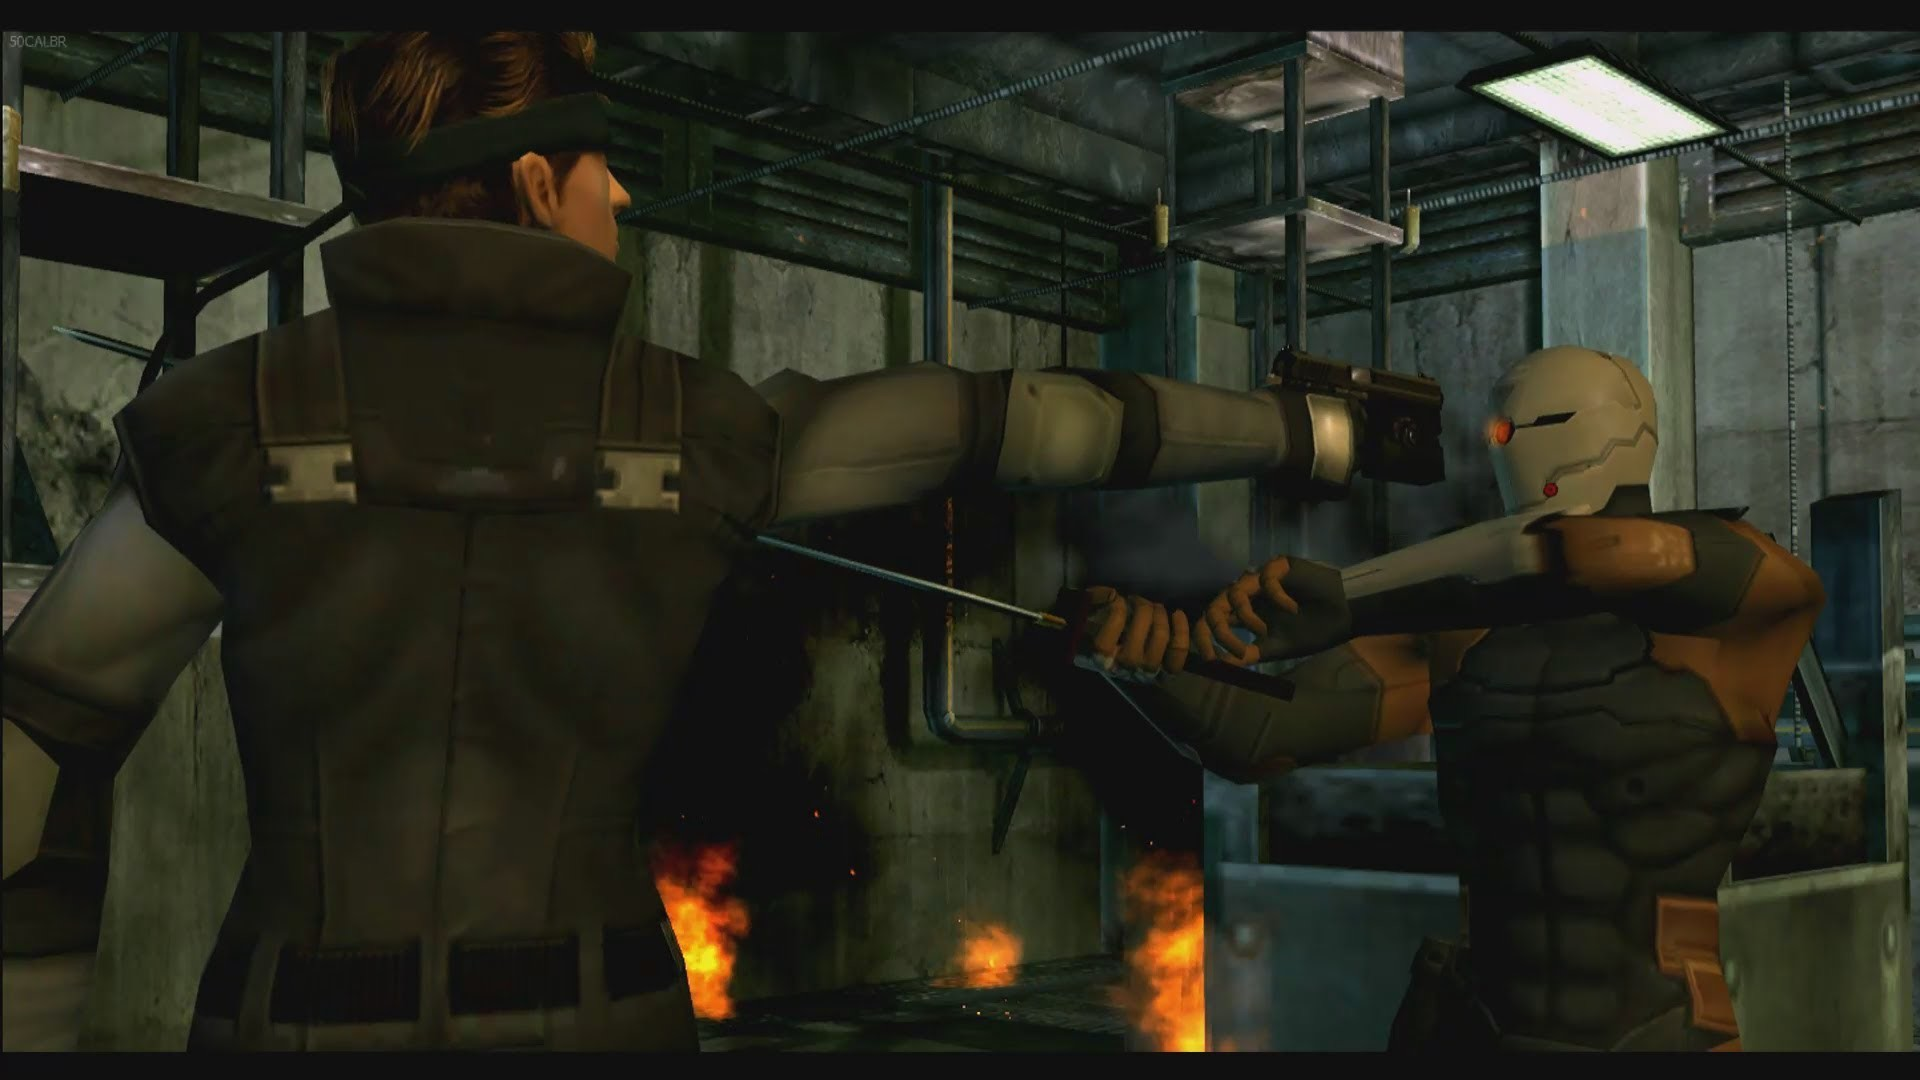 Metal Gear Profiles-David/Solid Snake Part II